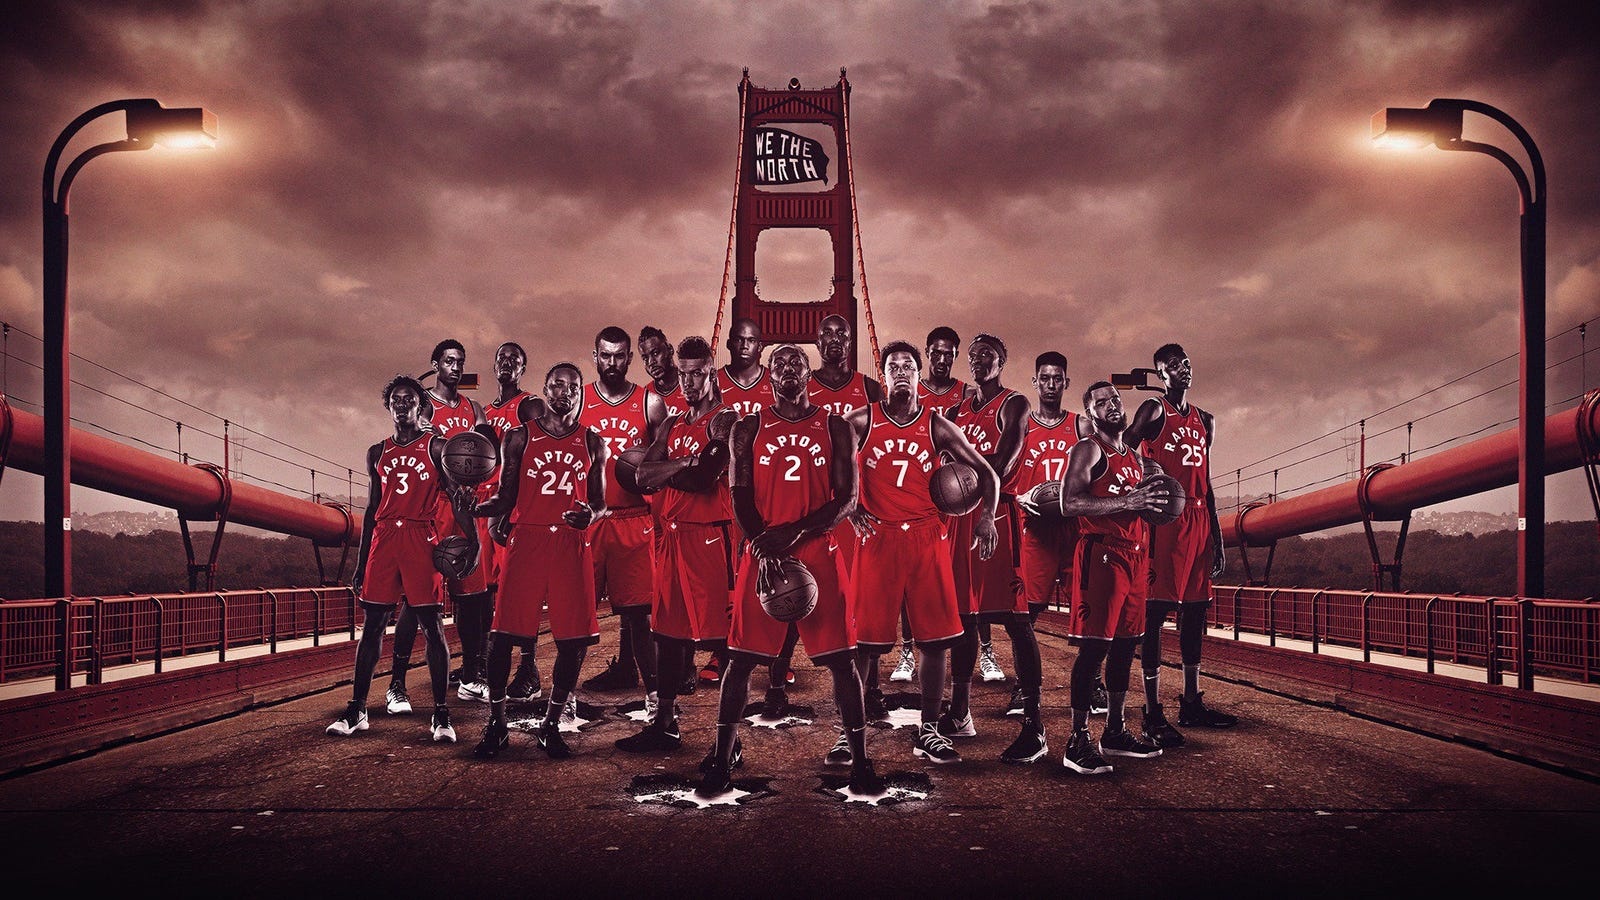 Lost Canadian Tourists-Ass Basketball Team Needs Urgent ...